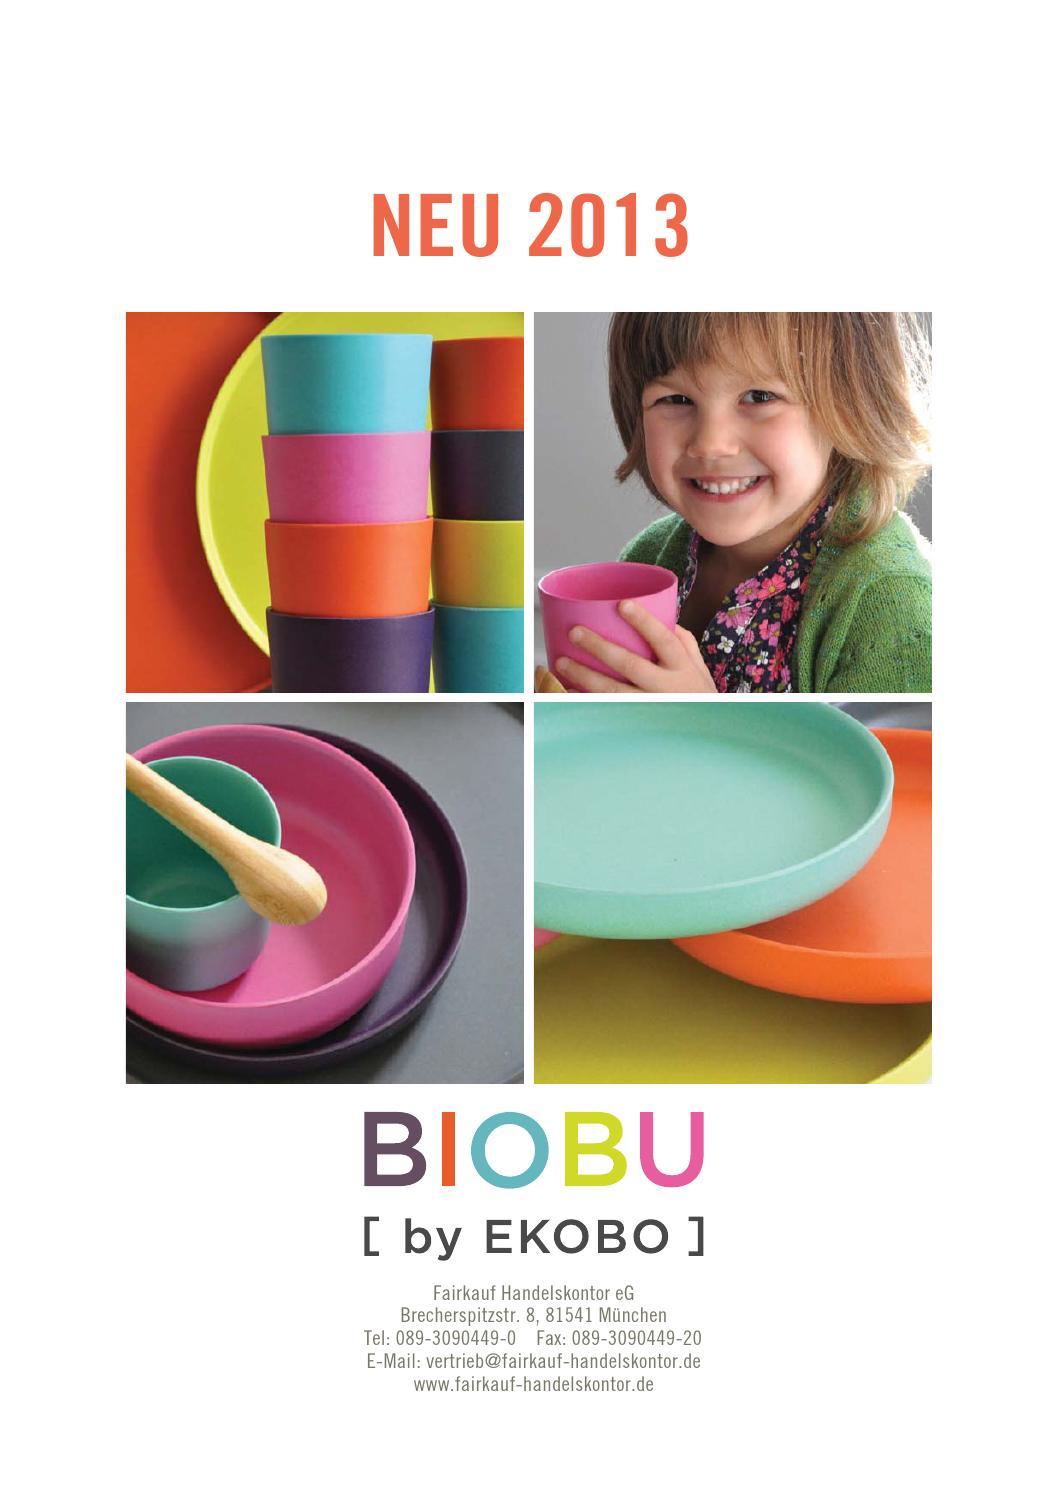 biobu by ekobo by fairkauf handelskontor eg issuu. Black Bedroom Furniture Sets. Home Design Ideas